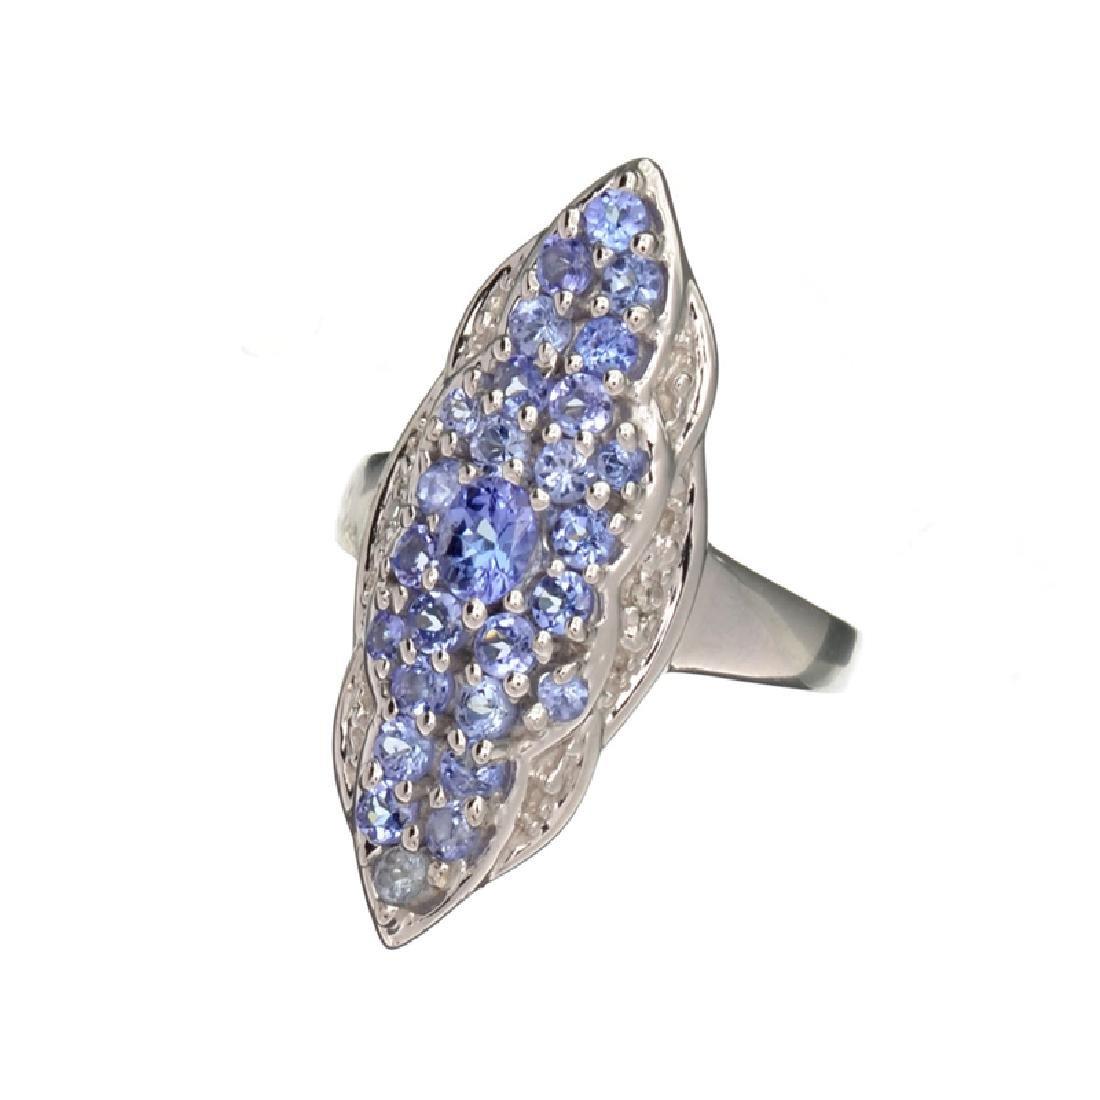 APP: 1.3k Fine Jewelry 0.97CT Oval/Round Cut Tanzanite